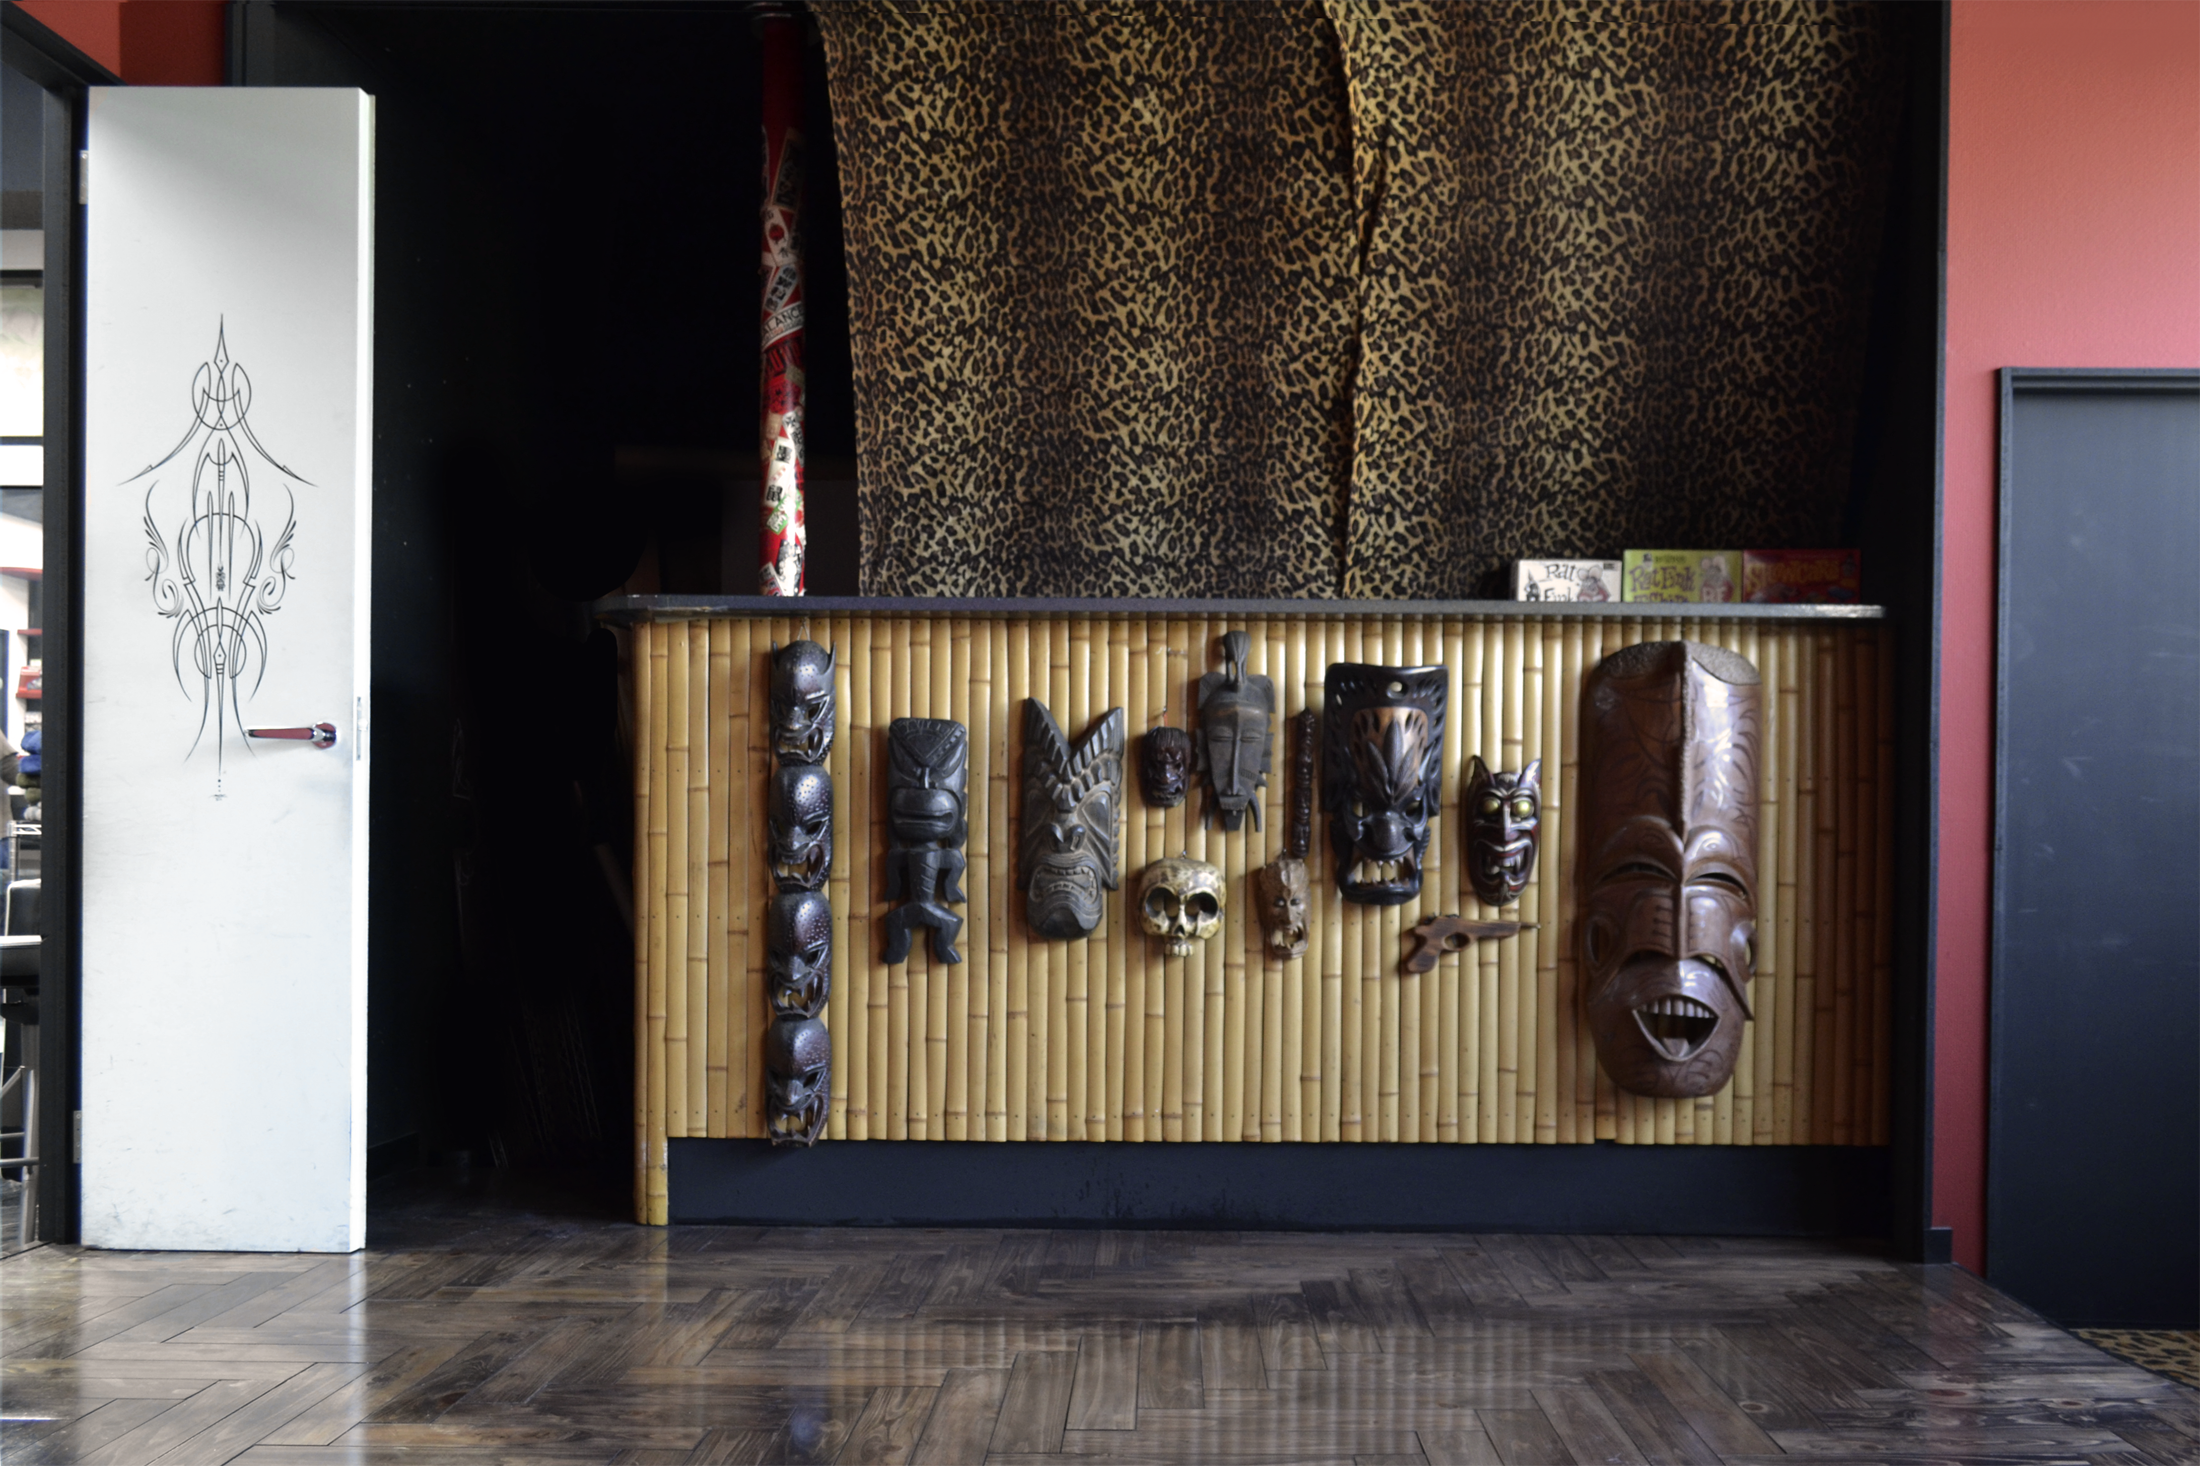 Black and gray worksメインイメージ | KINGRAT TATTOO | LAVA gallery | 福岡県北九州市